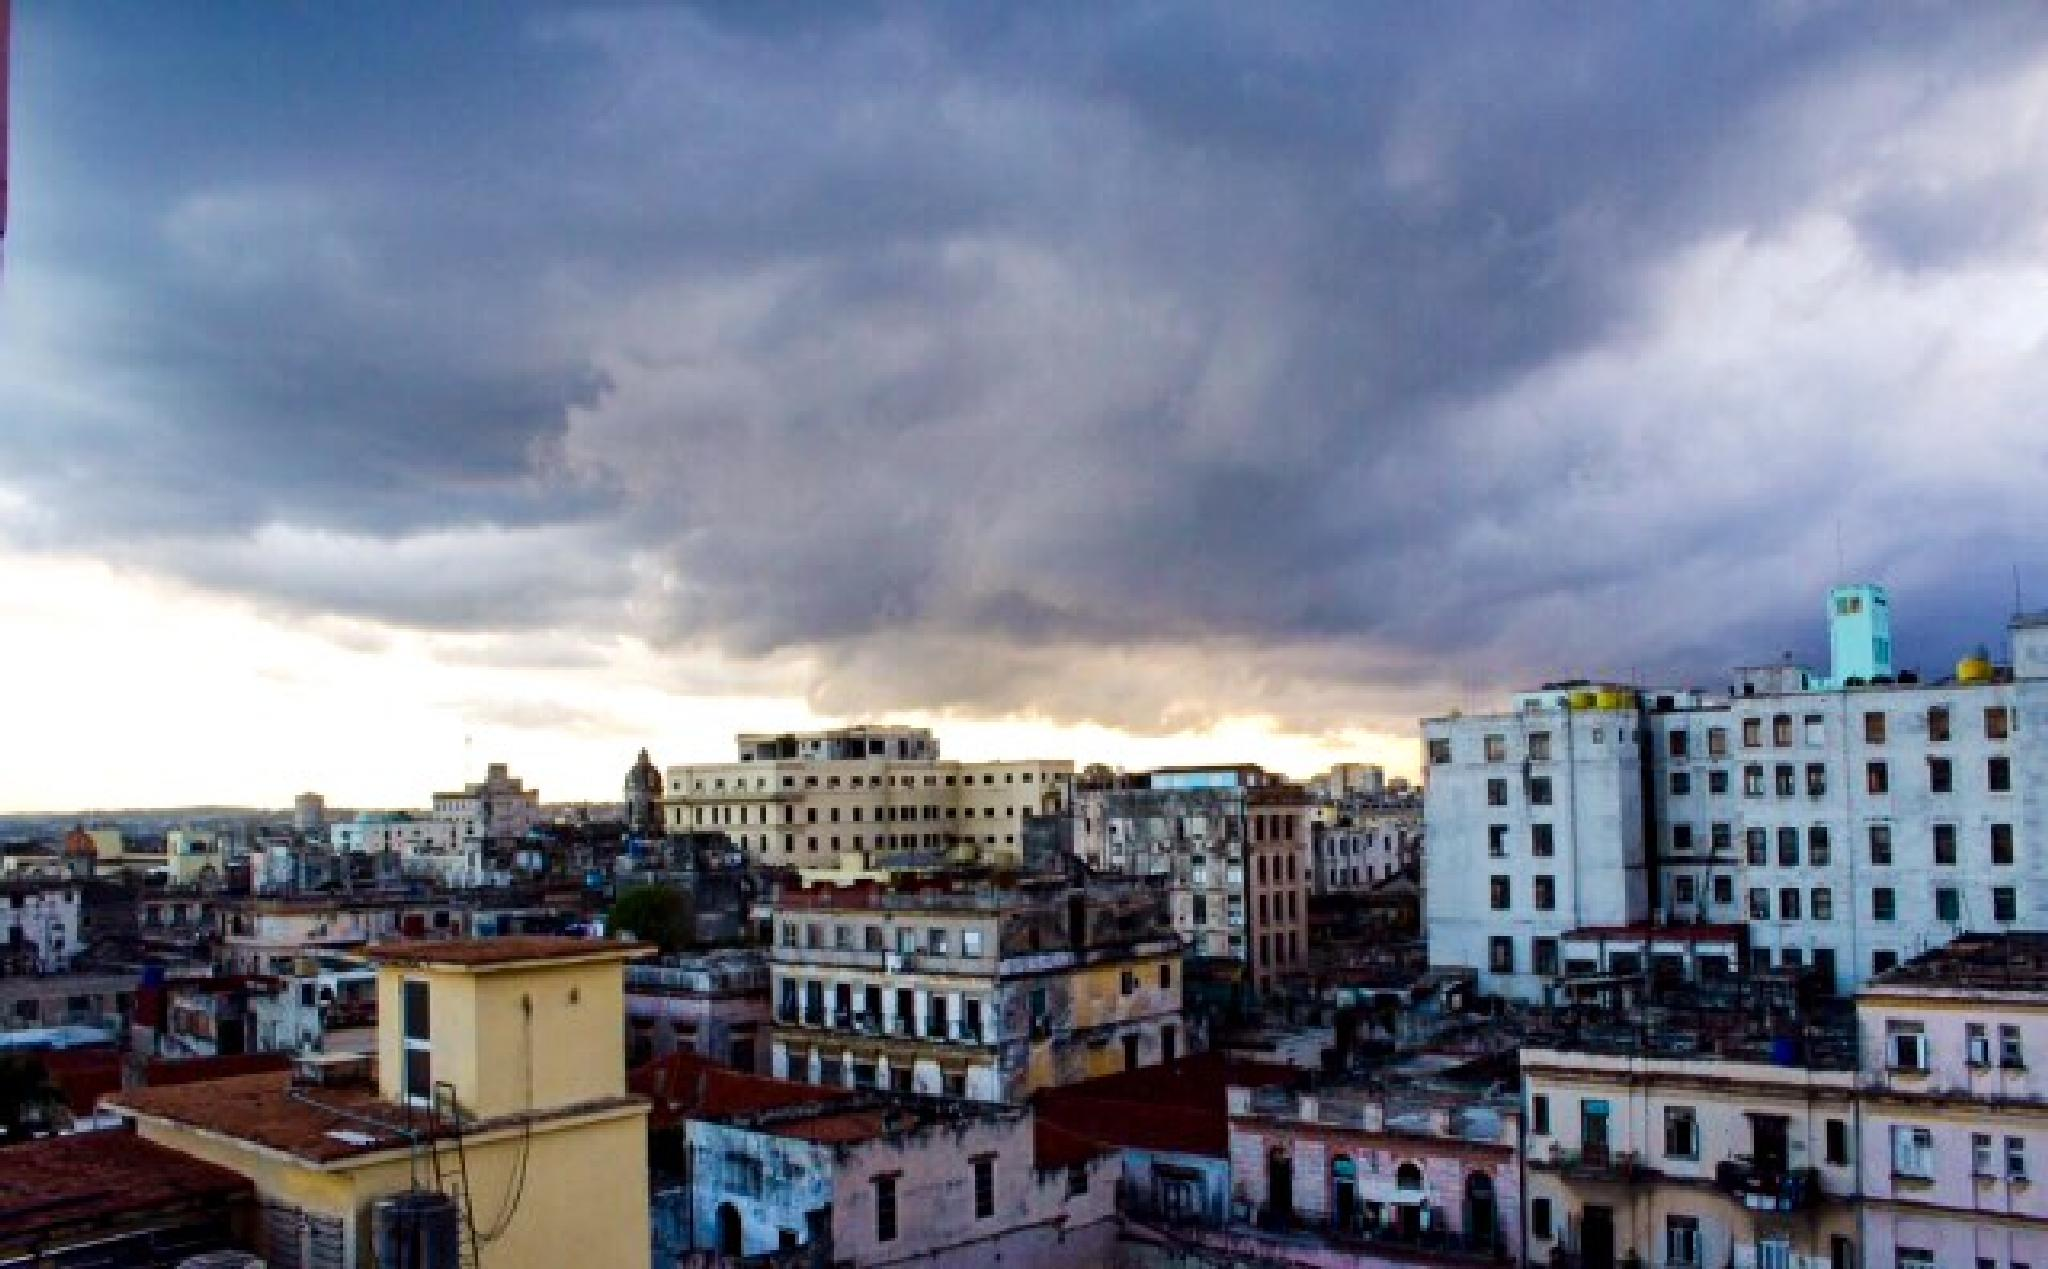 La Havana by IsabelVenturino